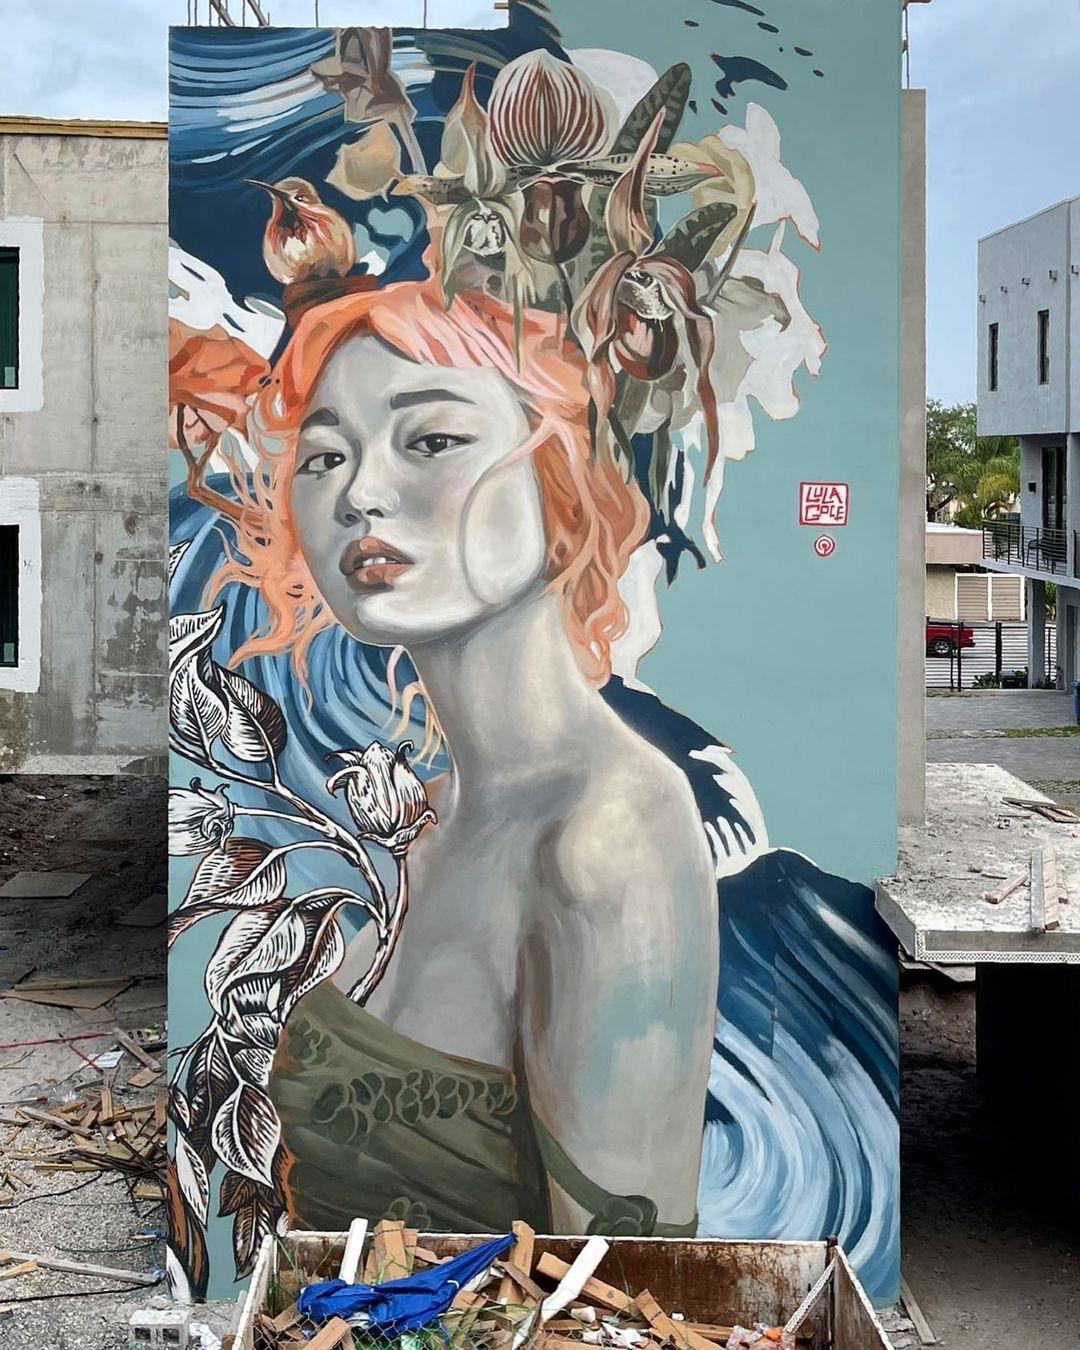 Lula Goce @ Fort Lauderdale, USA